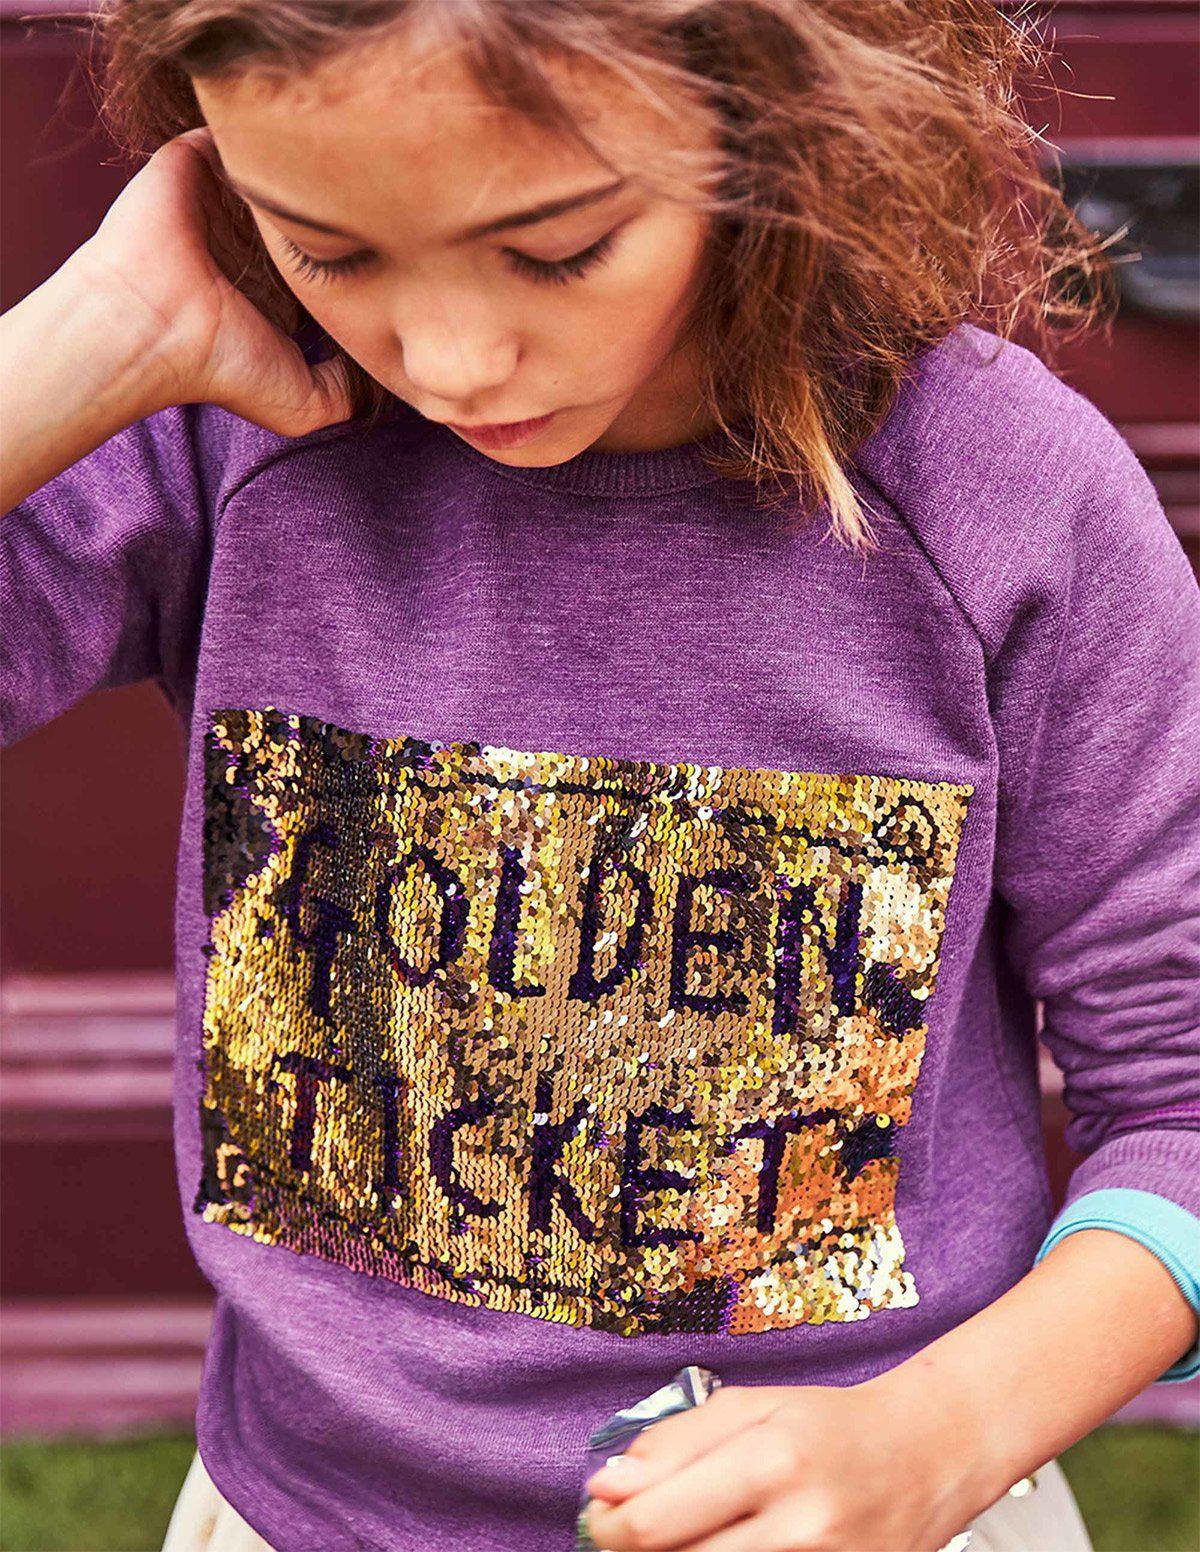 Boden Roald Dahl kids' clothing line